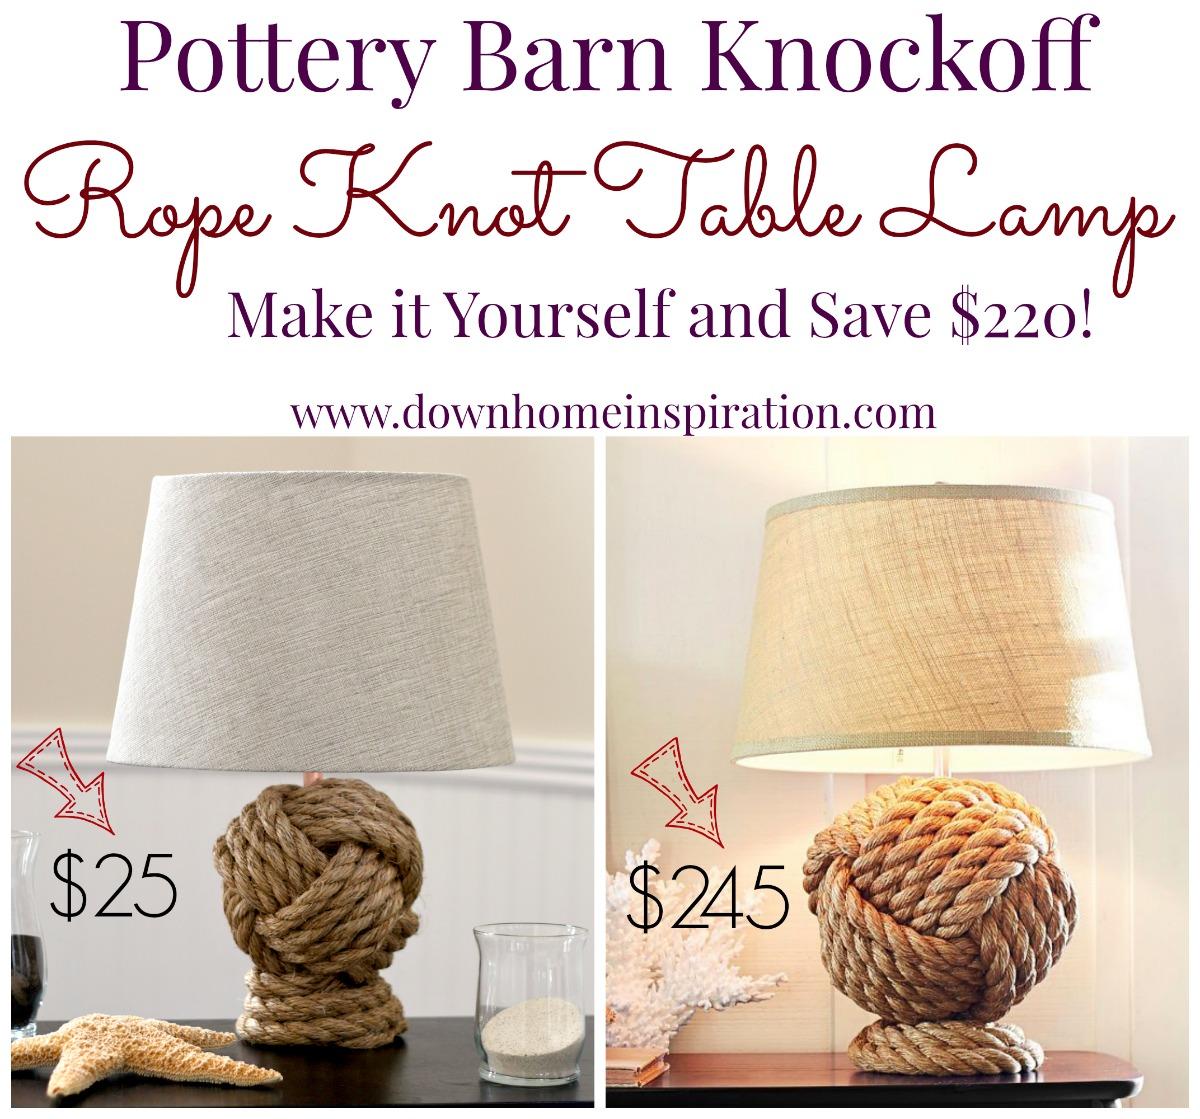 Pottery Barn Furniture Repair Kit: Pottery Barn Knockoff Rope Knot Lamp